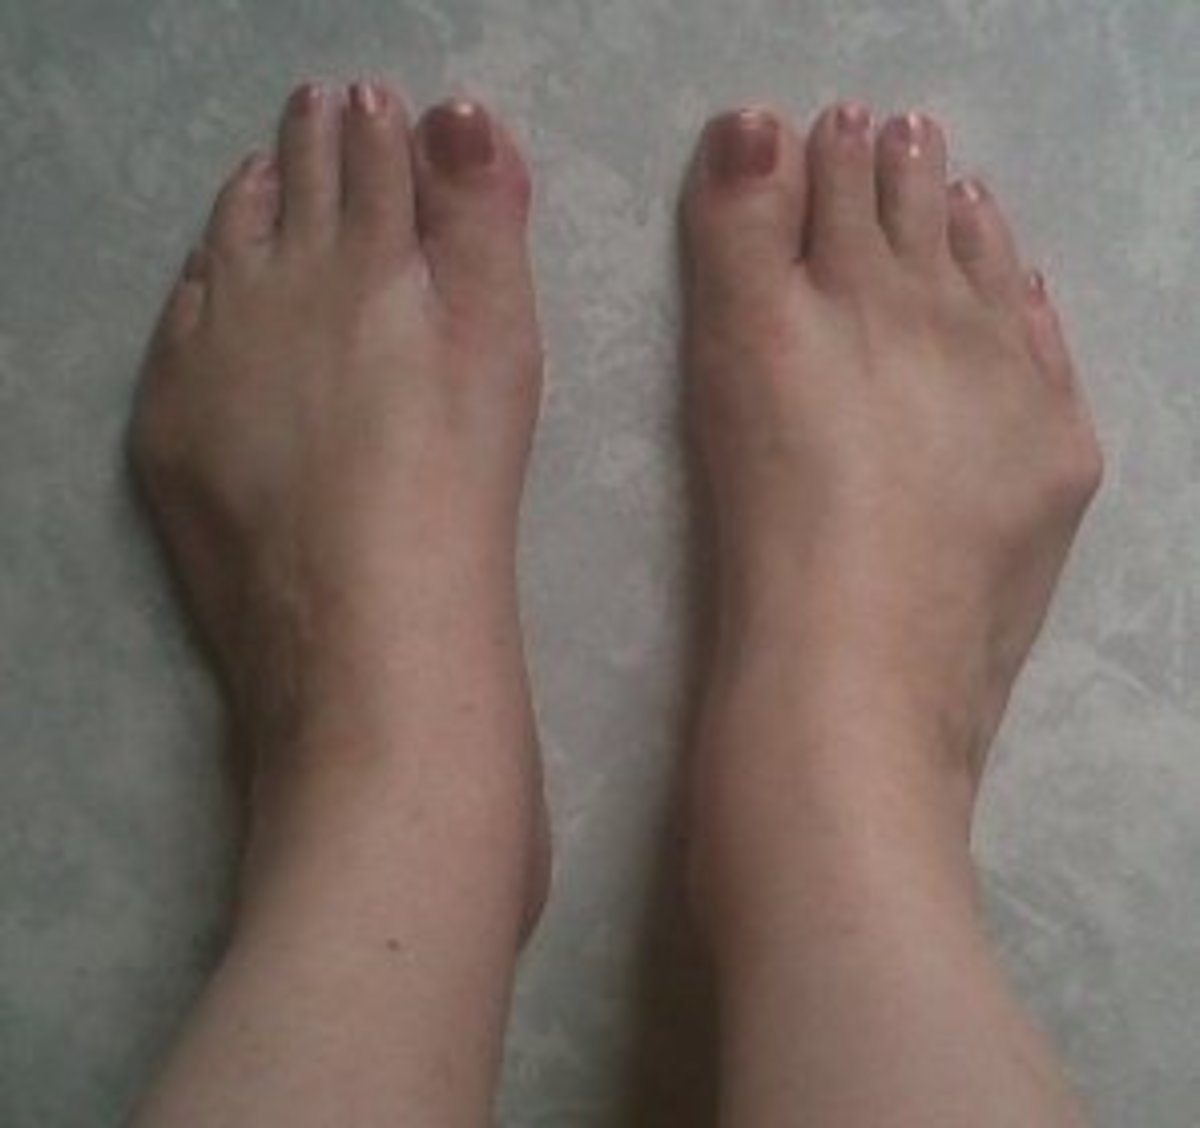 Flat, weird-looking feet, but so what, thank God I can walk and run...